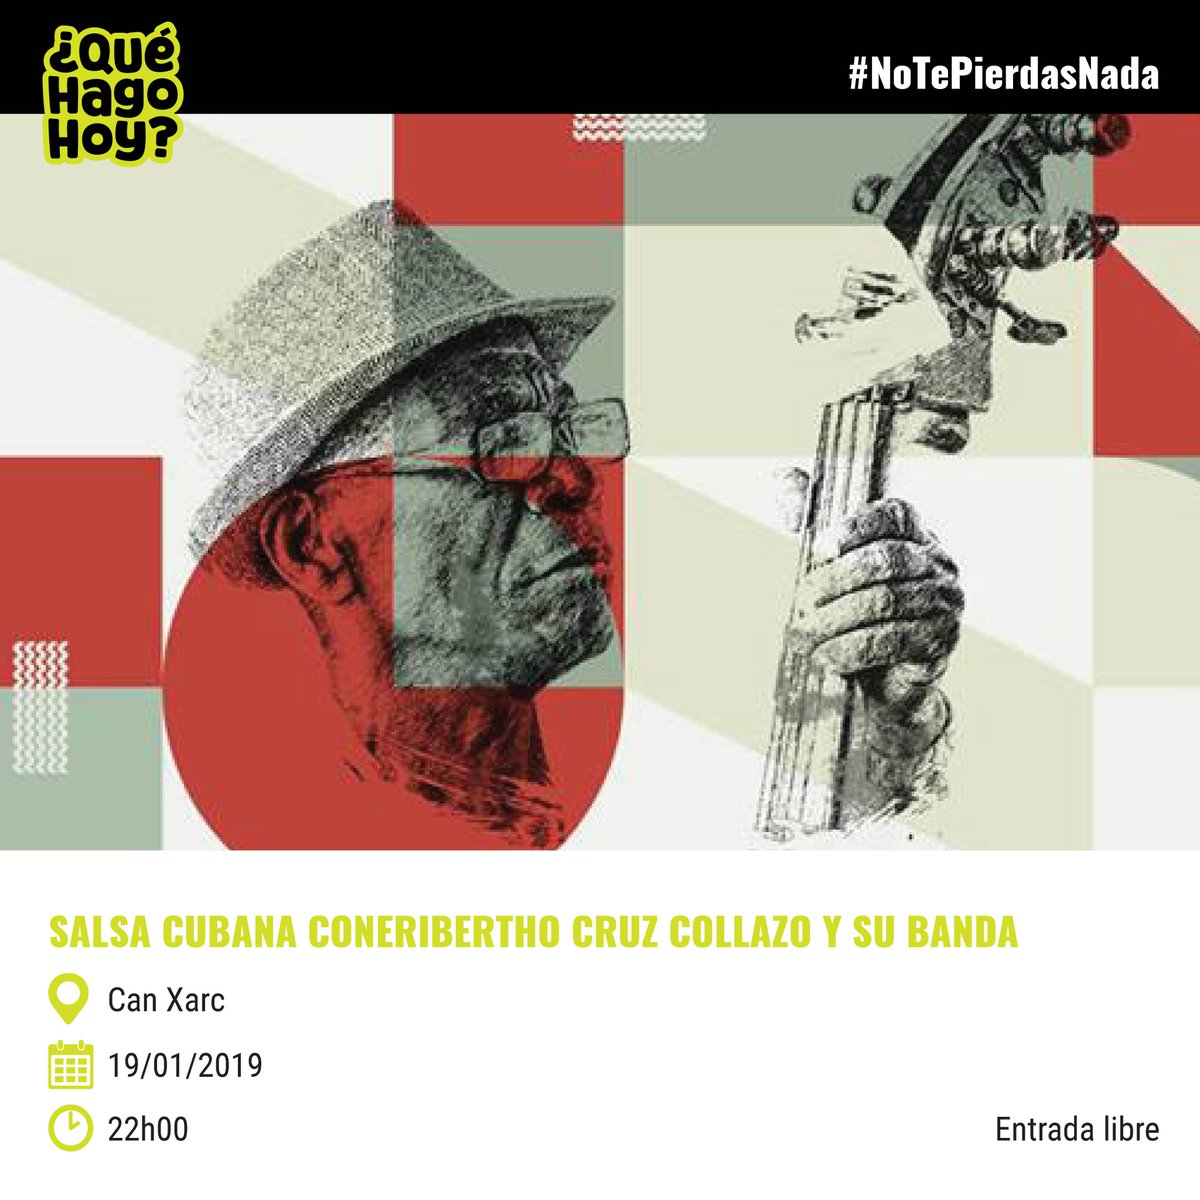 ¡Ritmos cubanos cada #sabado en el restaurante Can Xarc! A bailaaaaaar 💃💃💃  👉🏼 Más eventos: http://www.quehagohoyibiza.com    #notepierdasnada #hot #ibiza #music #friends #amazing #party